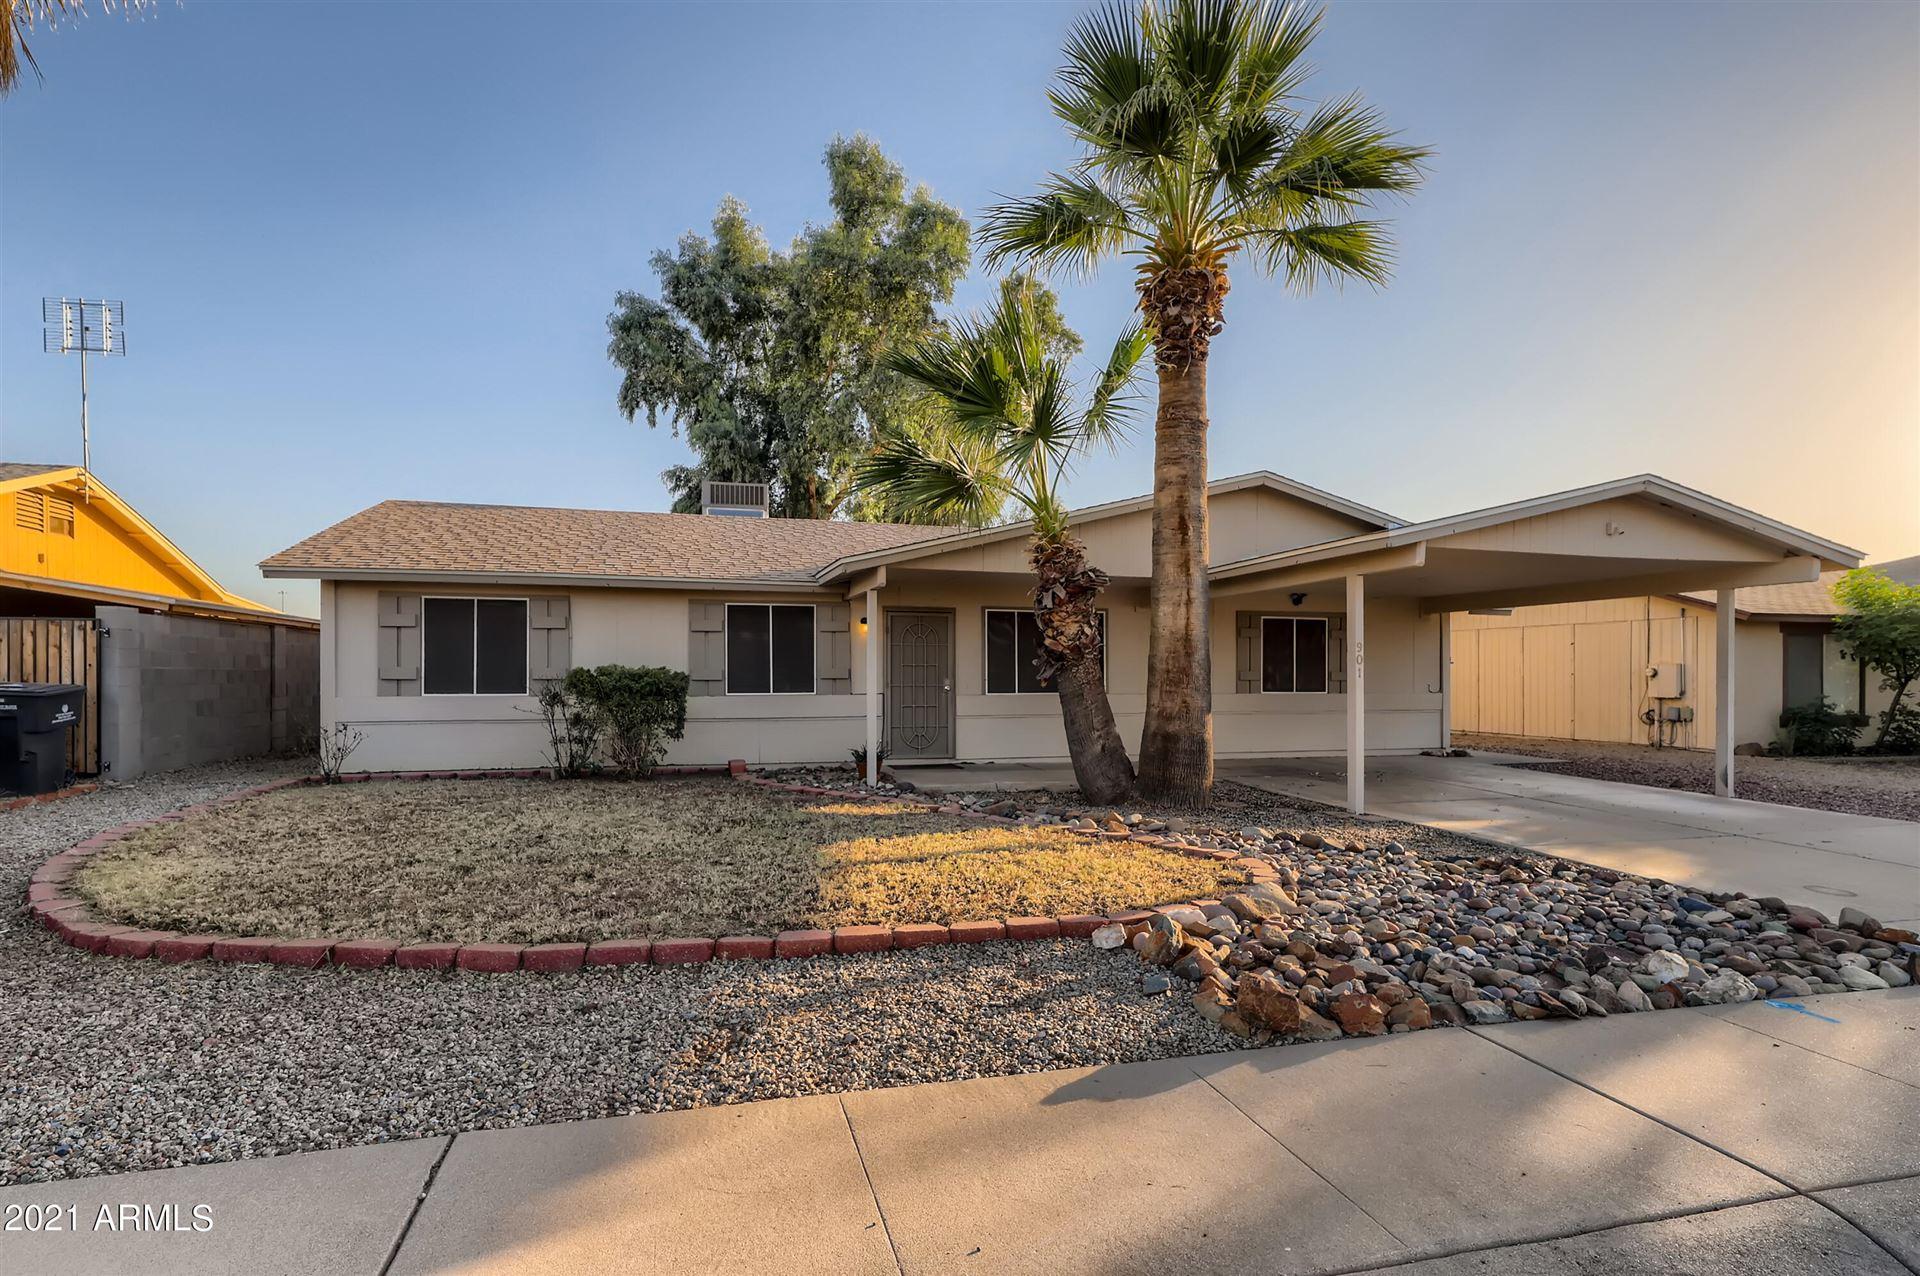 901 W TONOPAH Drive, Phoenix, AZ 85027 - MLS#: 6309580